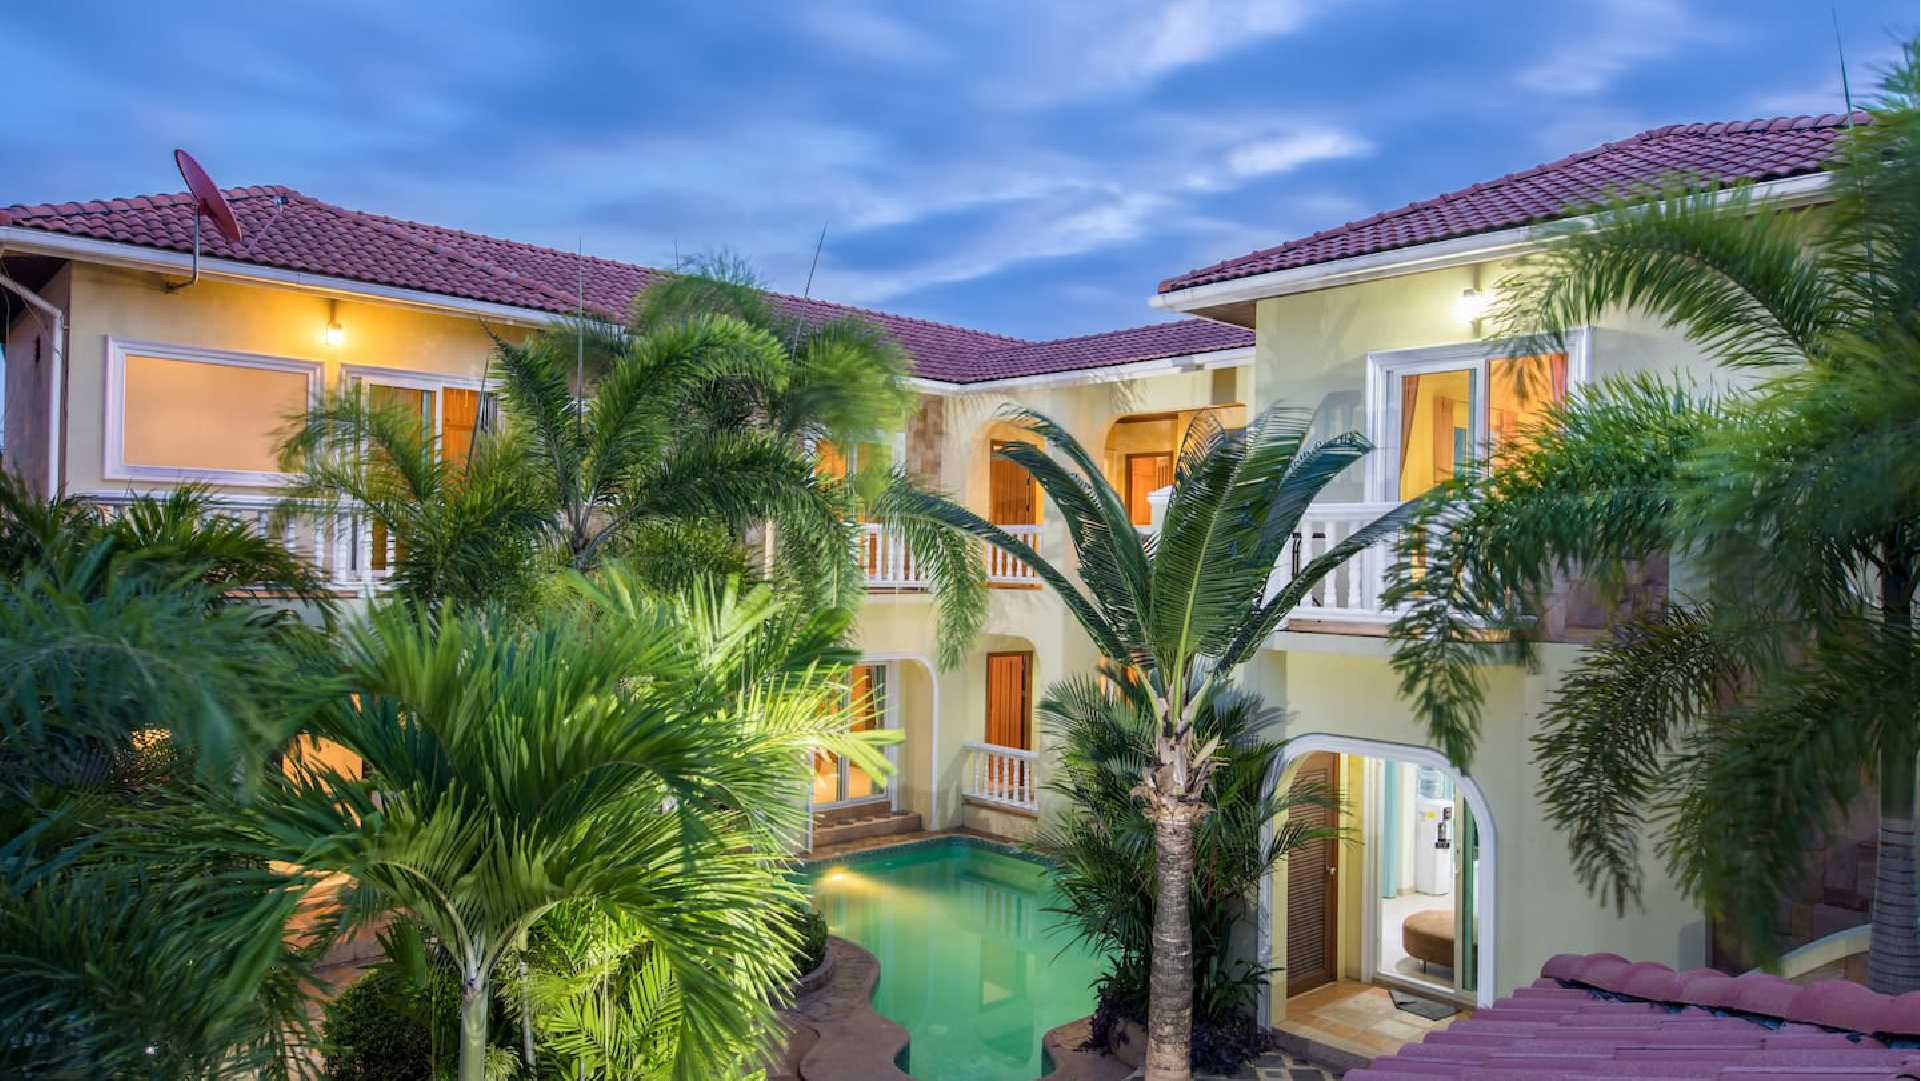 115 Bedroom Pool Villa